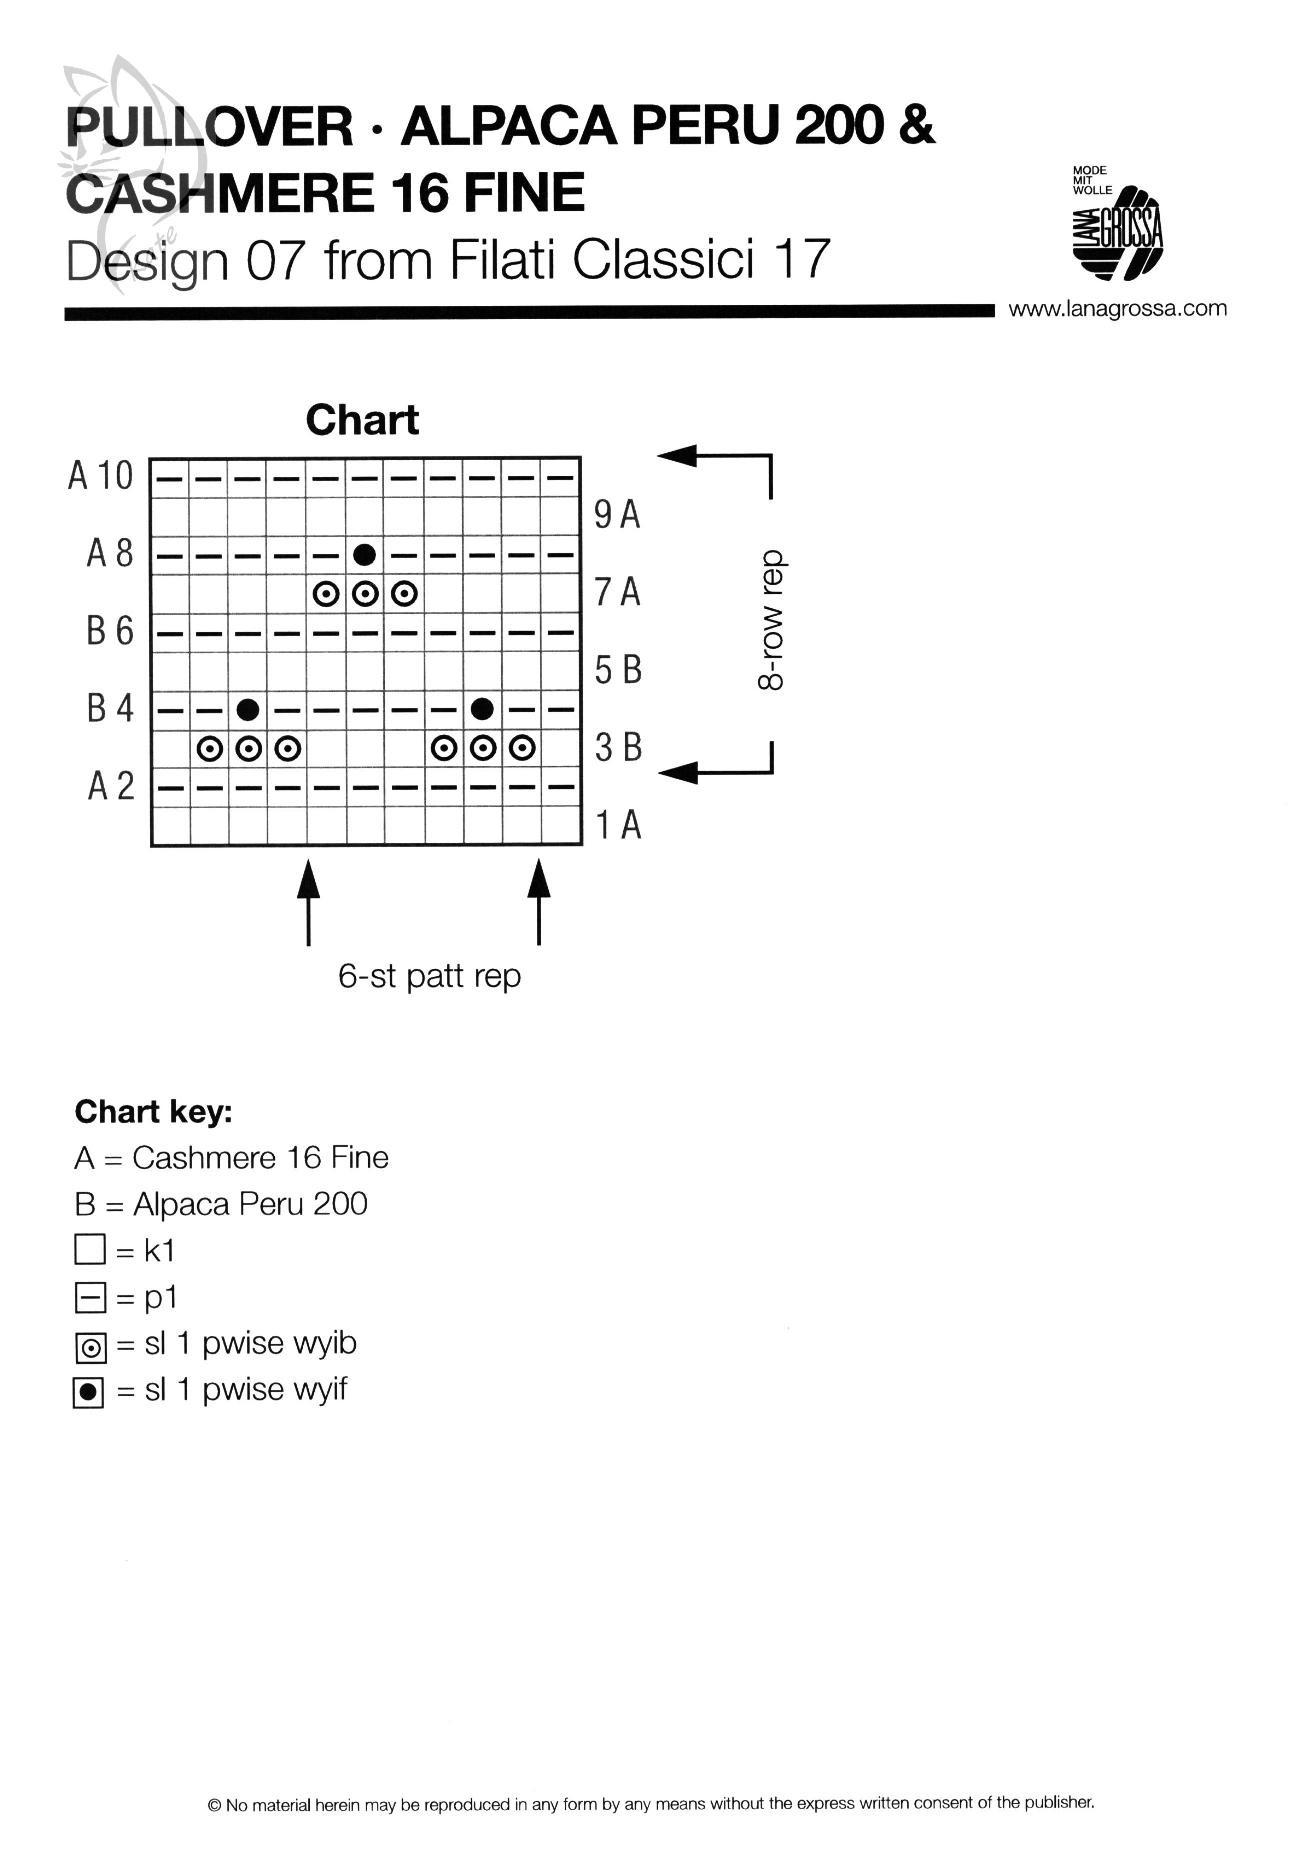 Page_00126.jpg